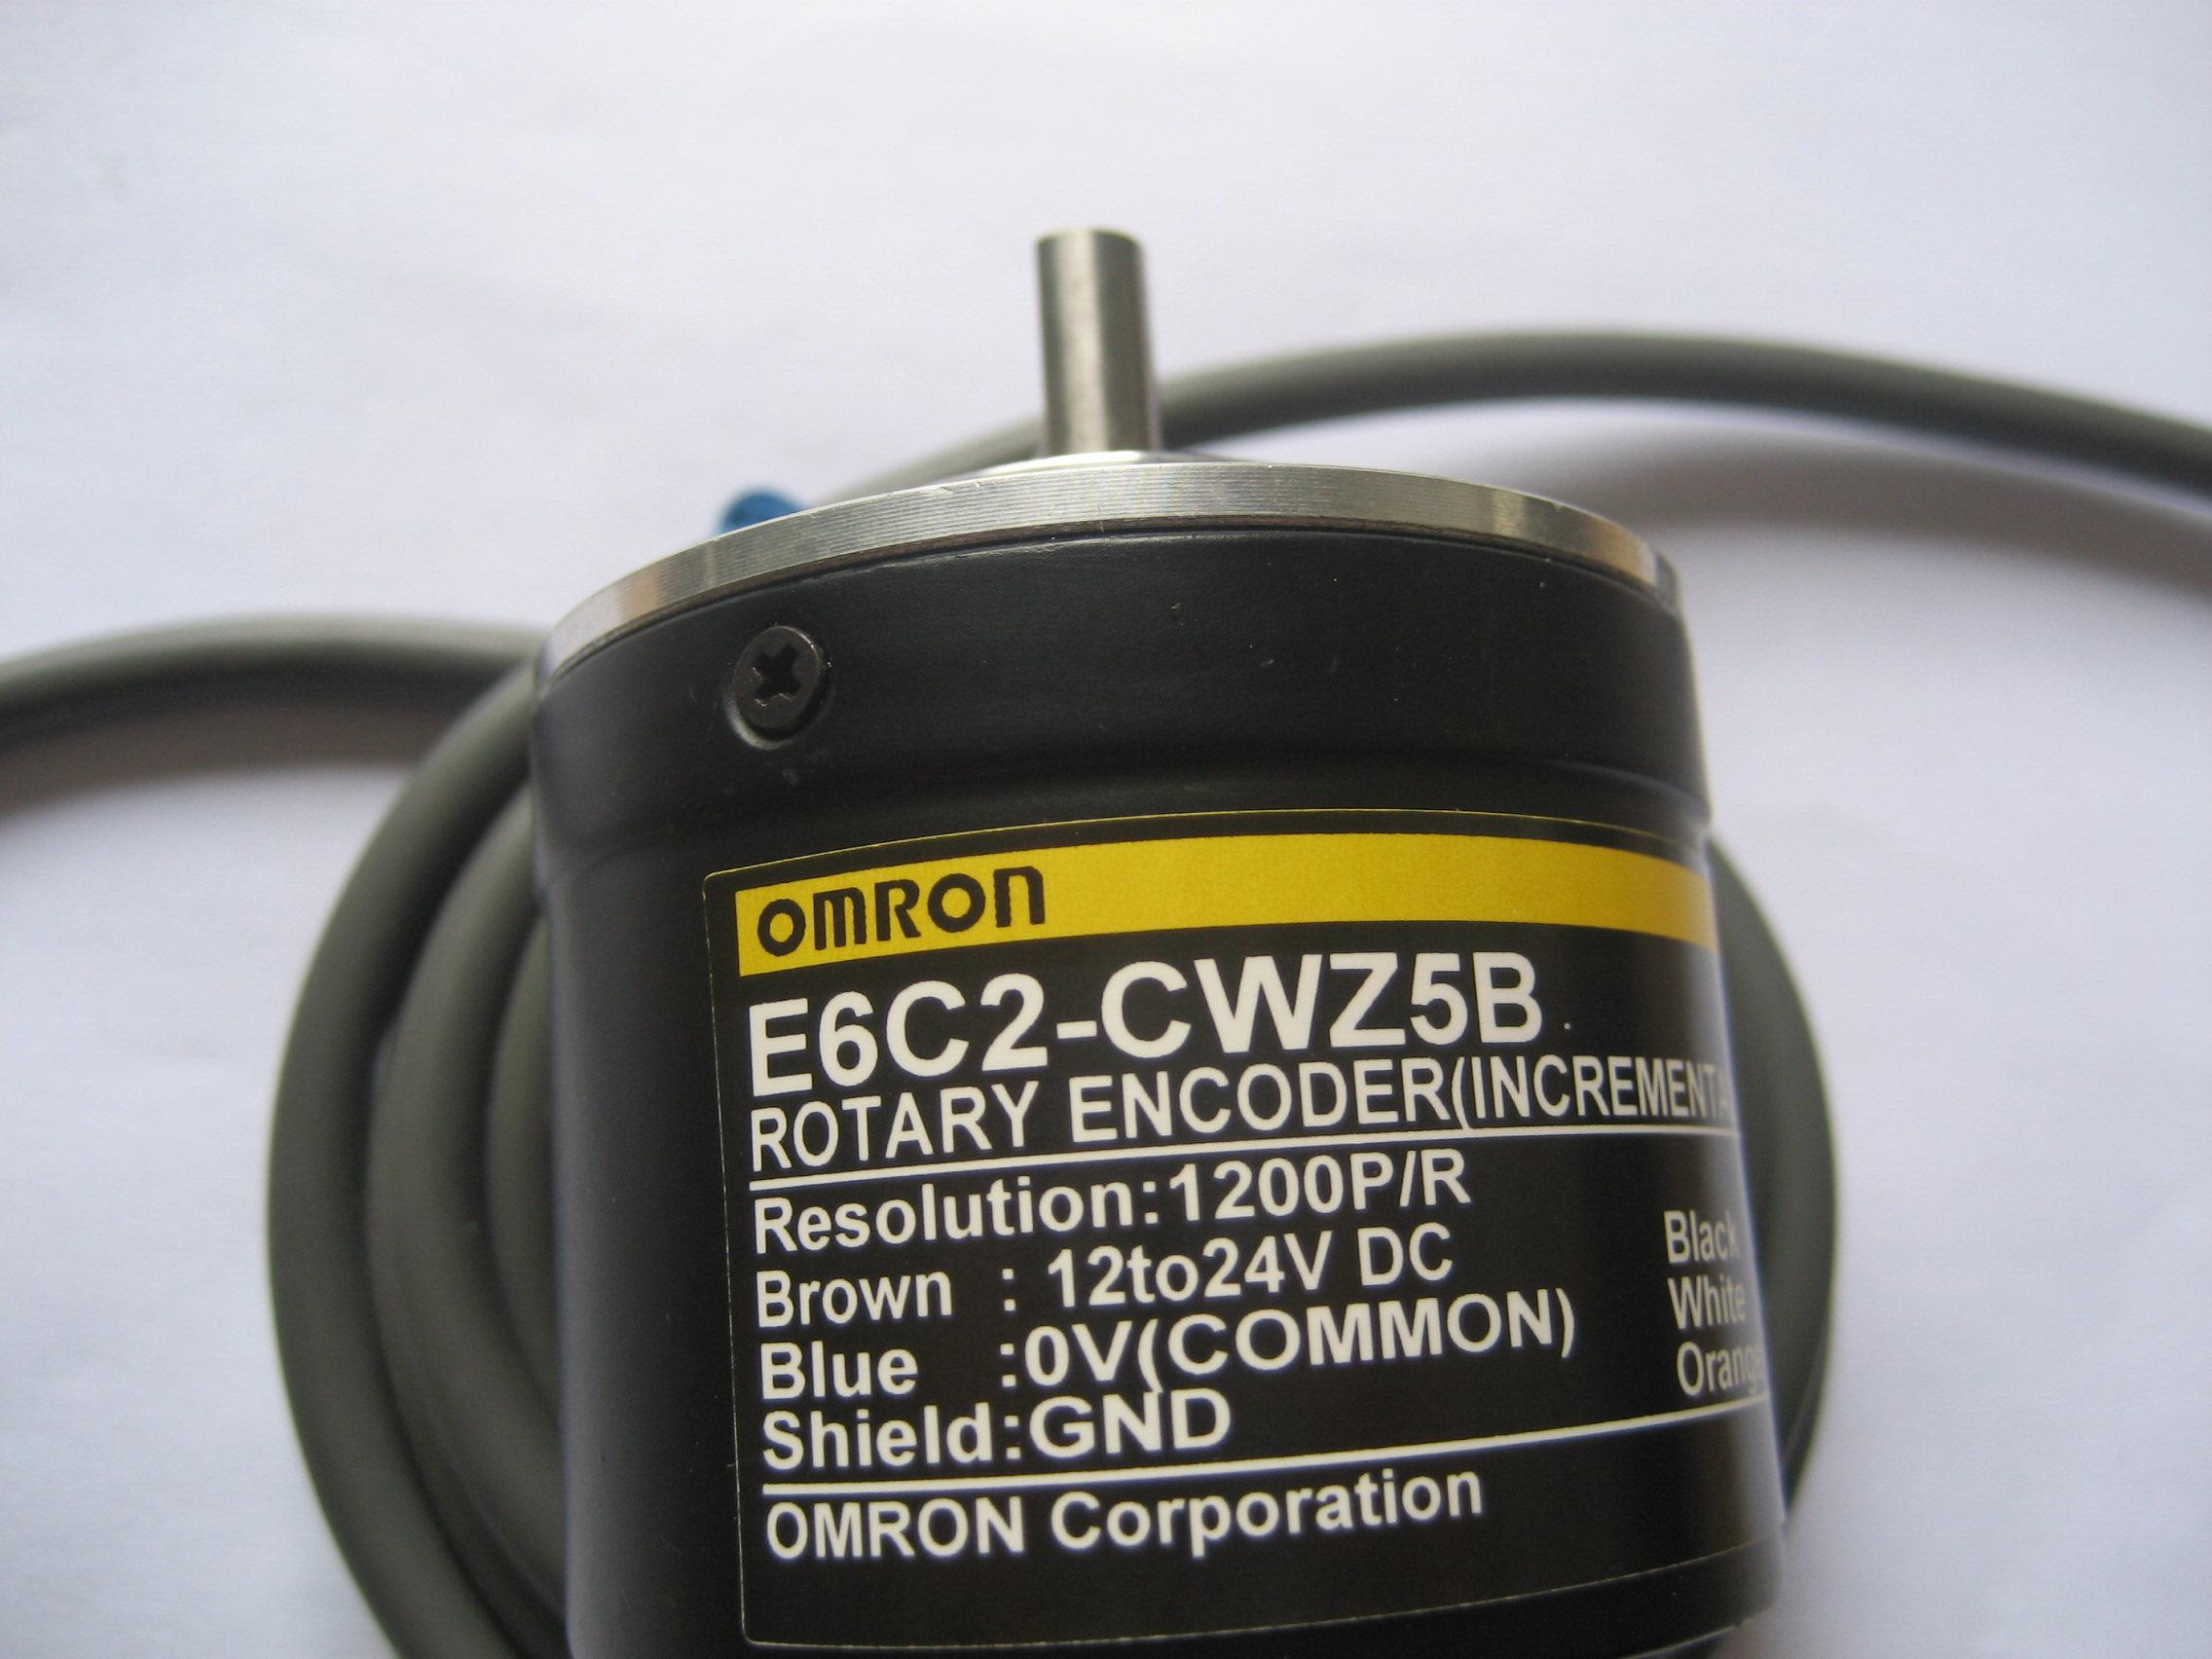 FREE SHIPPING Encoder Coupling Counter Rotary Encoder E6c2-cwz5b 360P/R